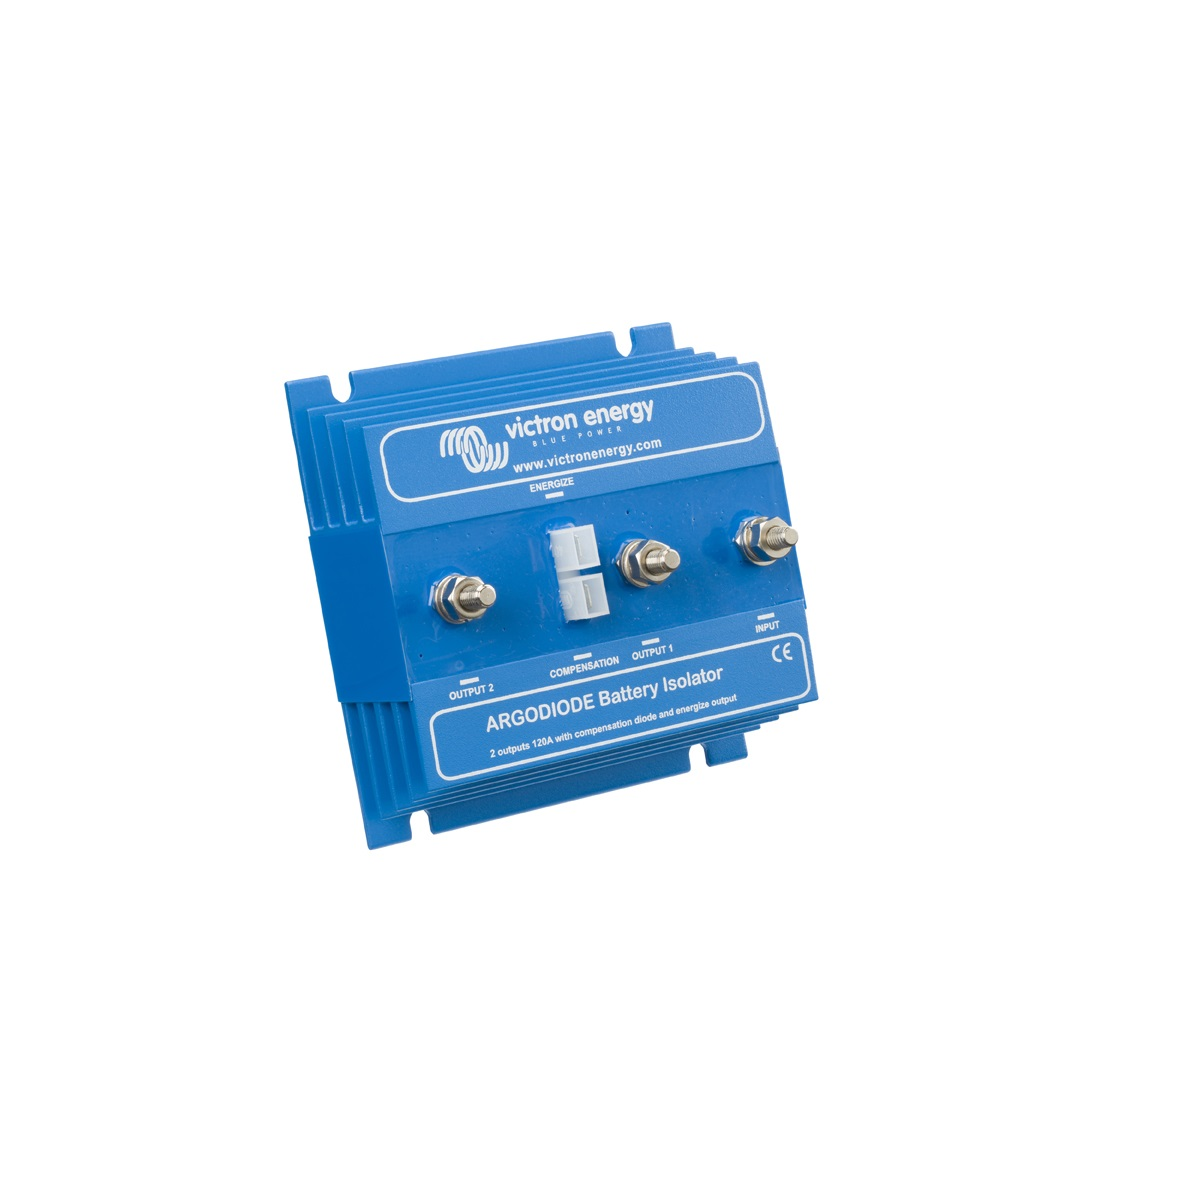 Victron-Energy-ARGODIODE-Batteri-Isolator